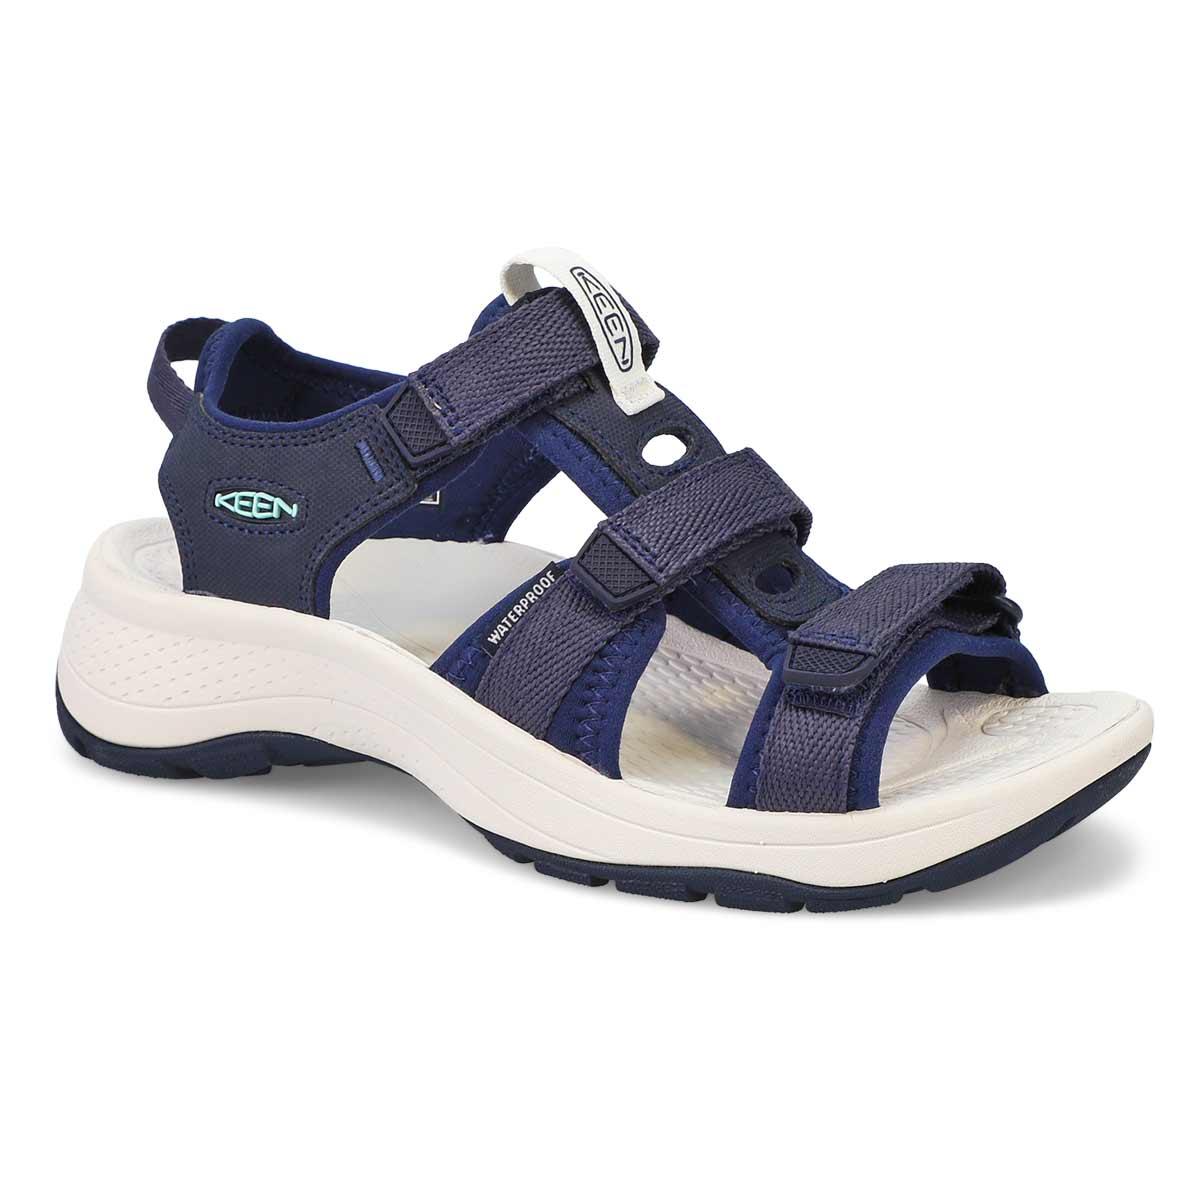 Women's Astoria West Open Toe Sandals - Blue/Iris